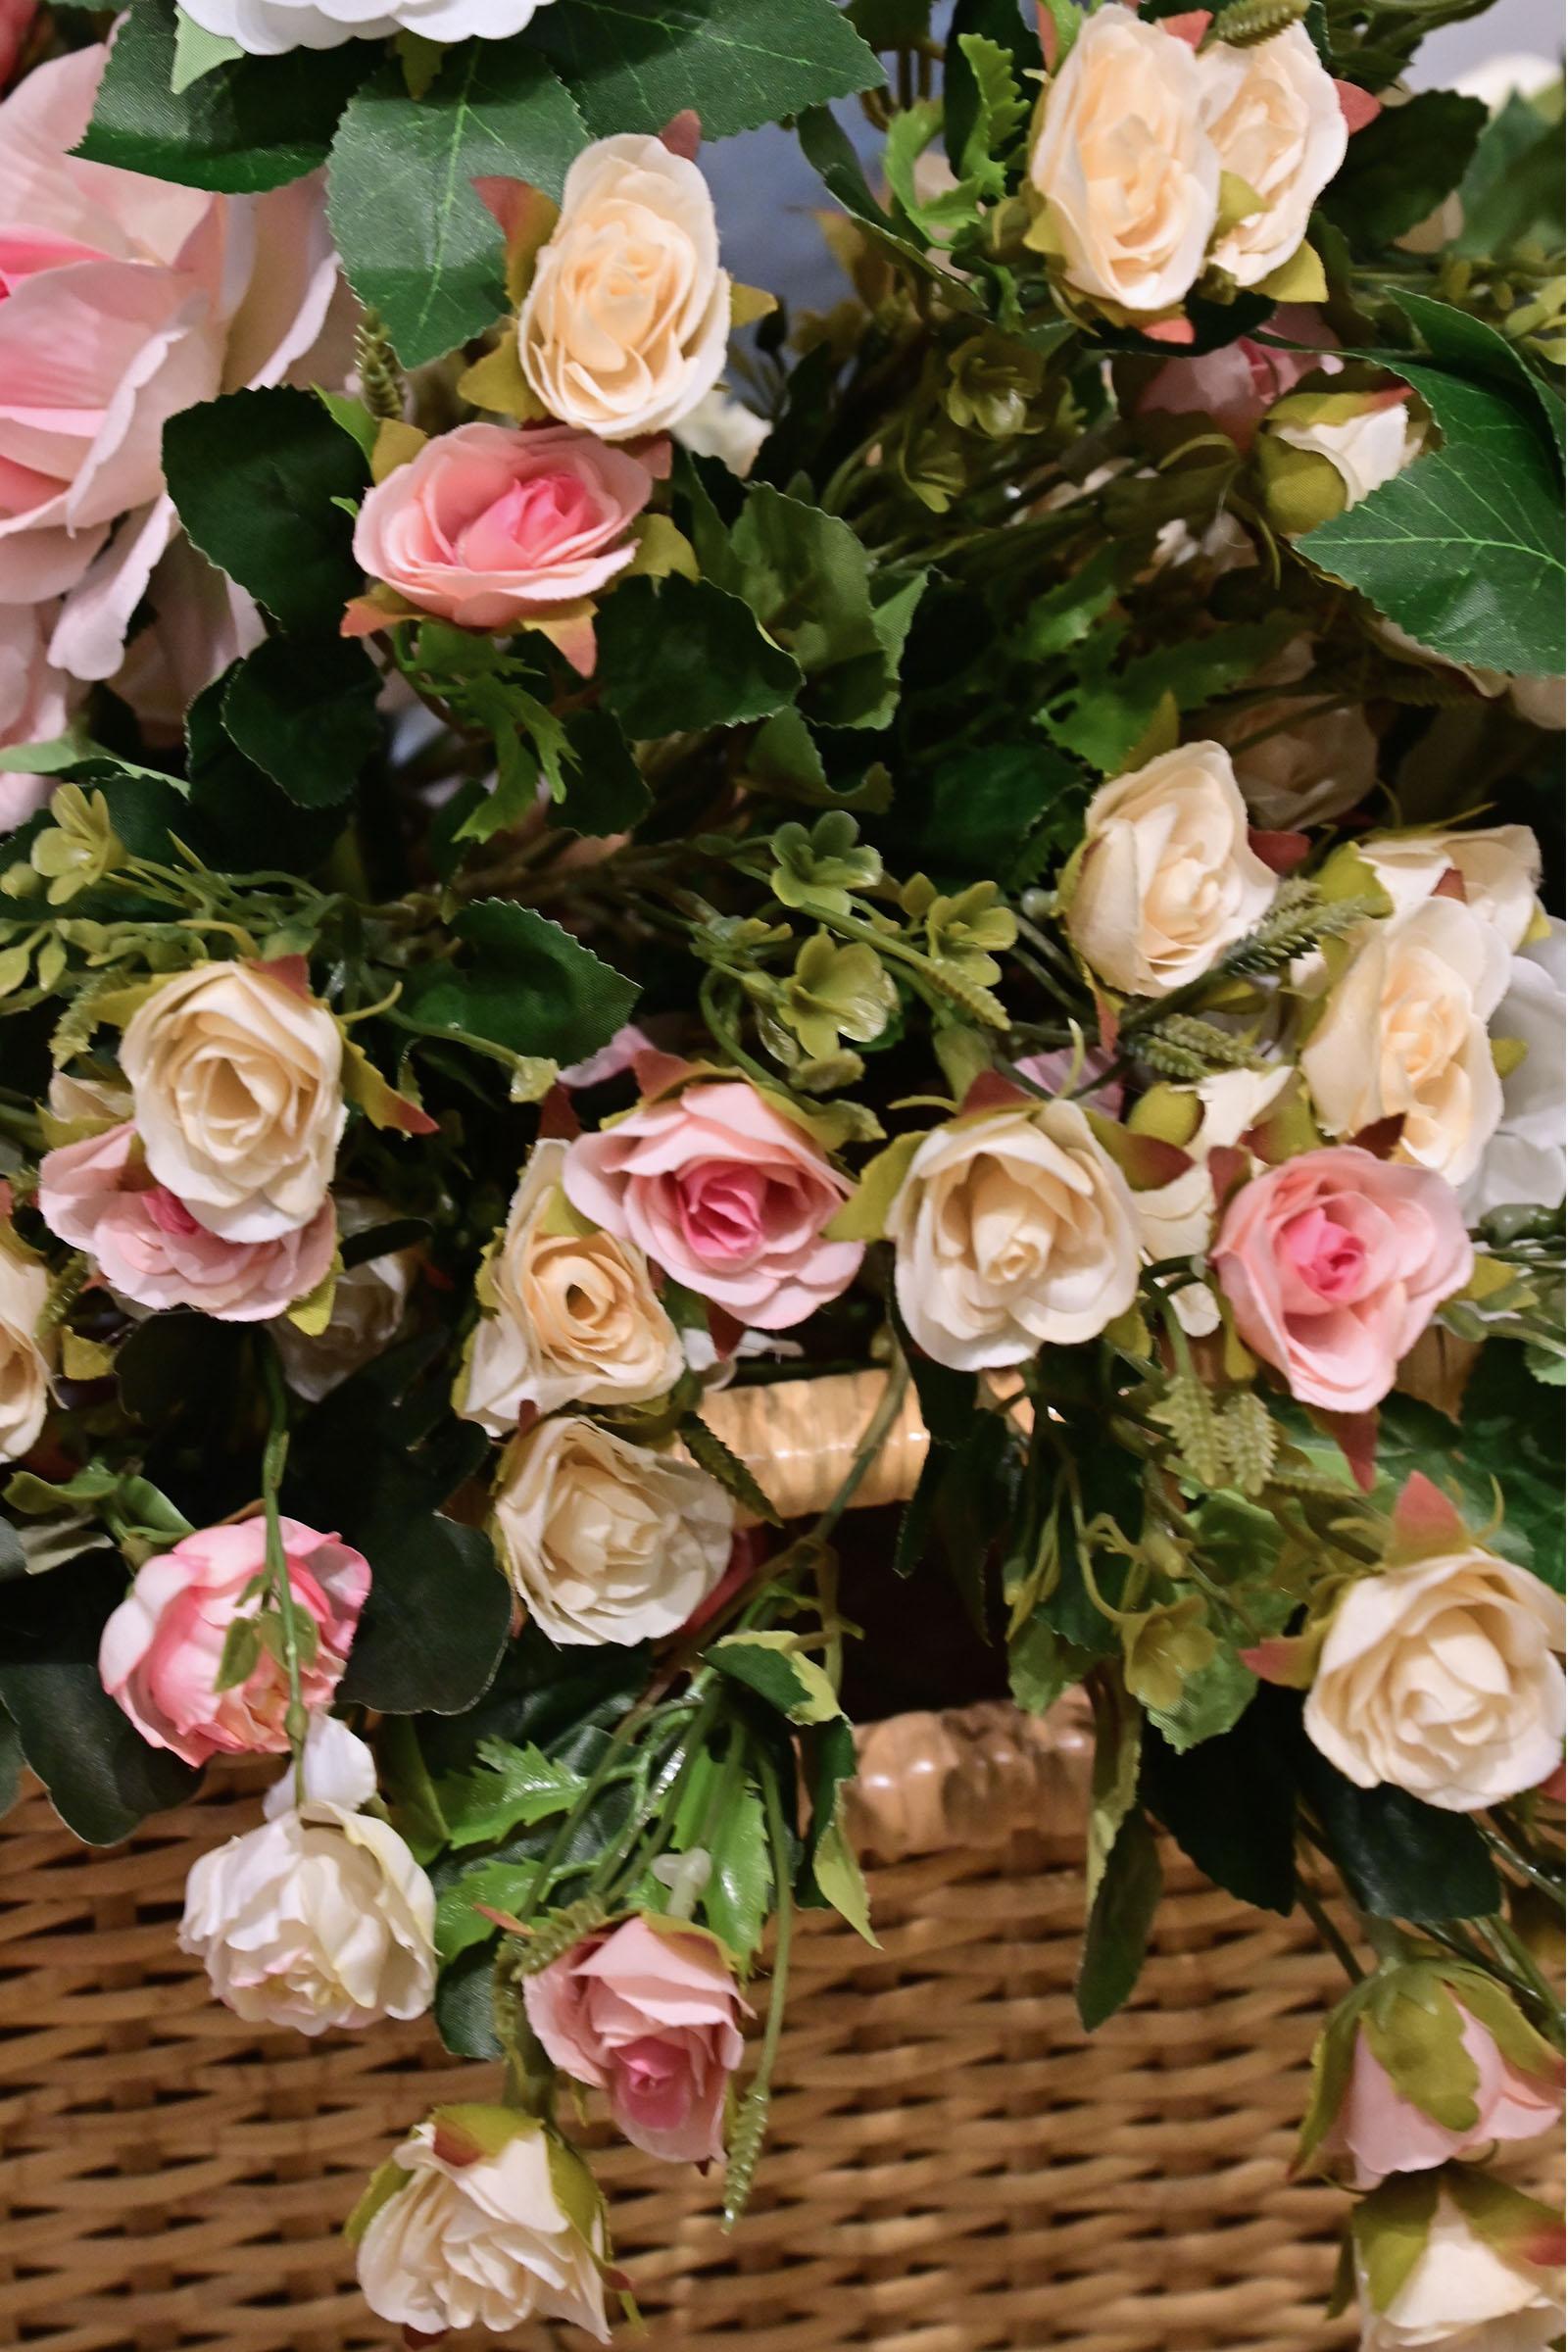 Pink & White Florets